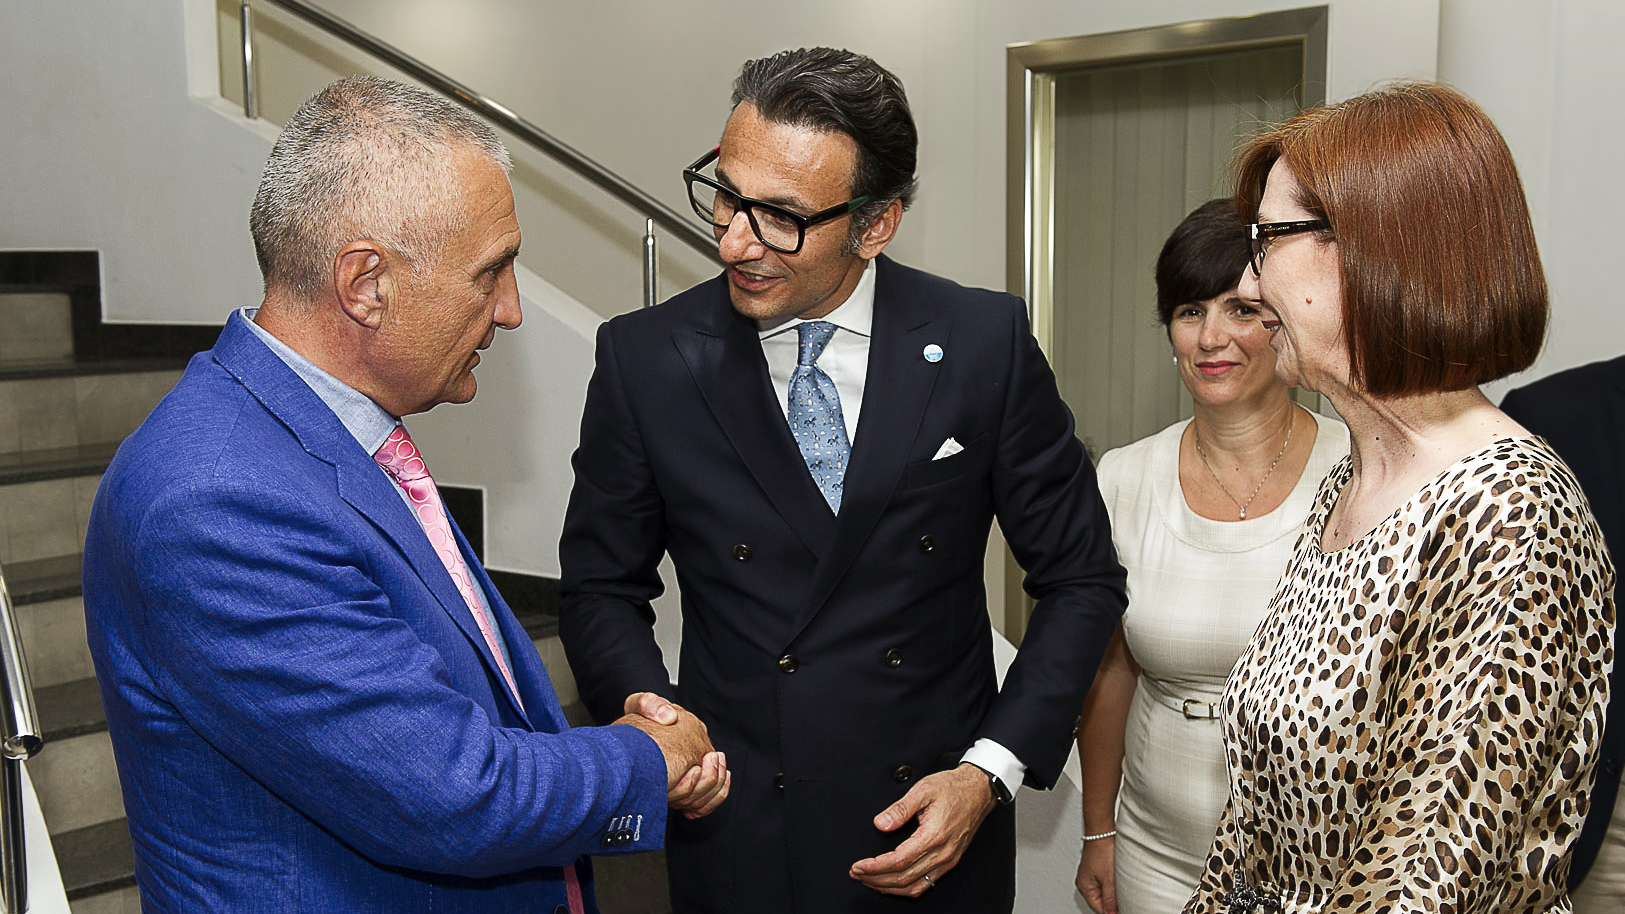 presidente-albania-01-hires.jpg